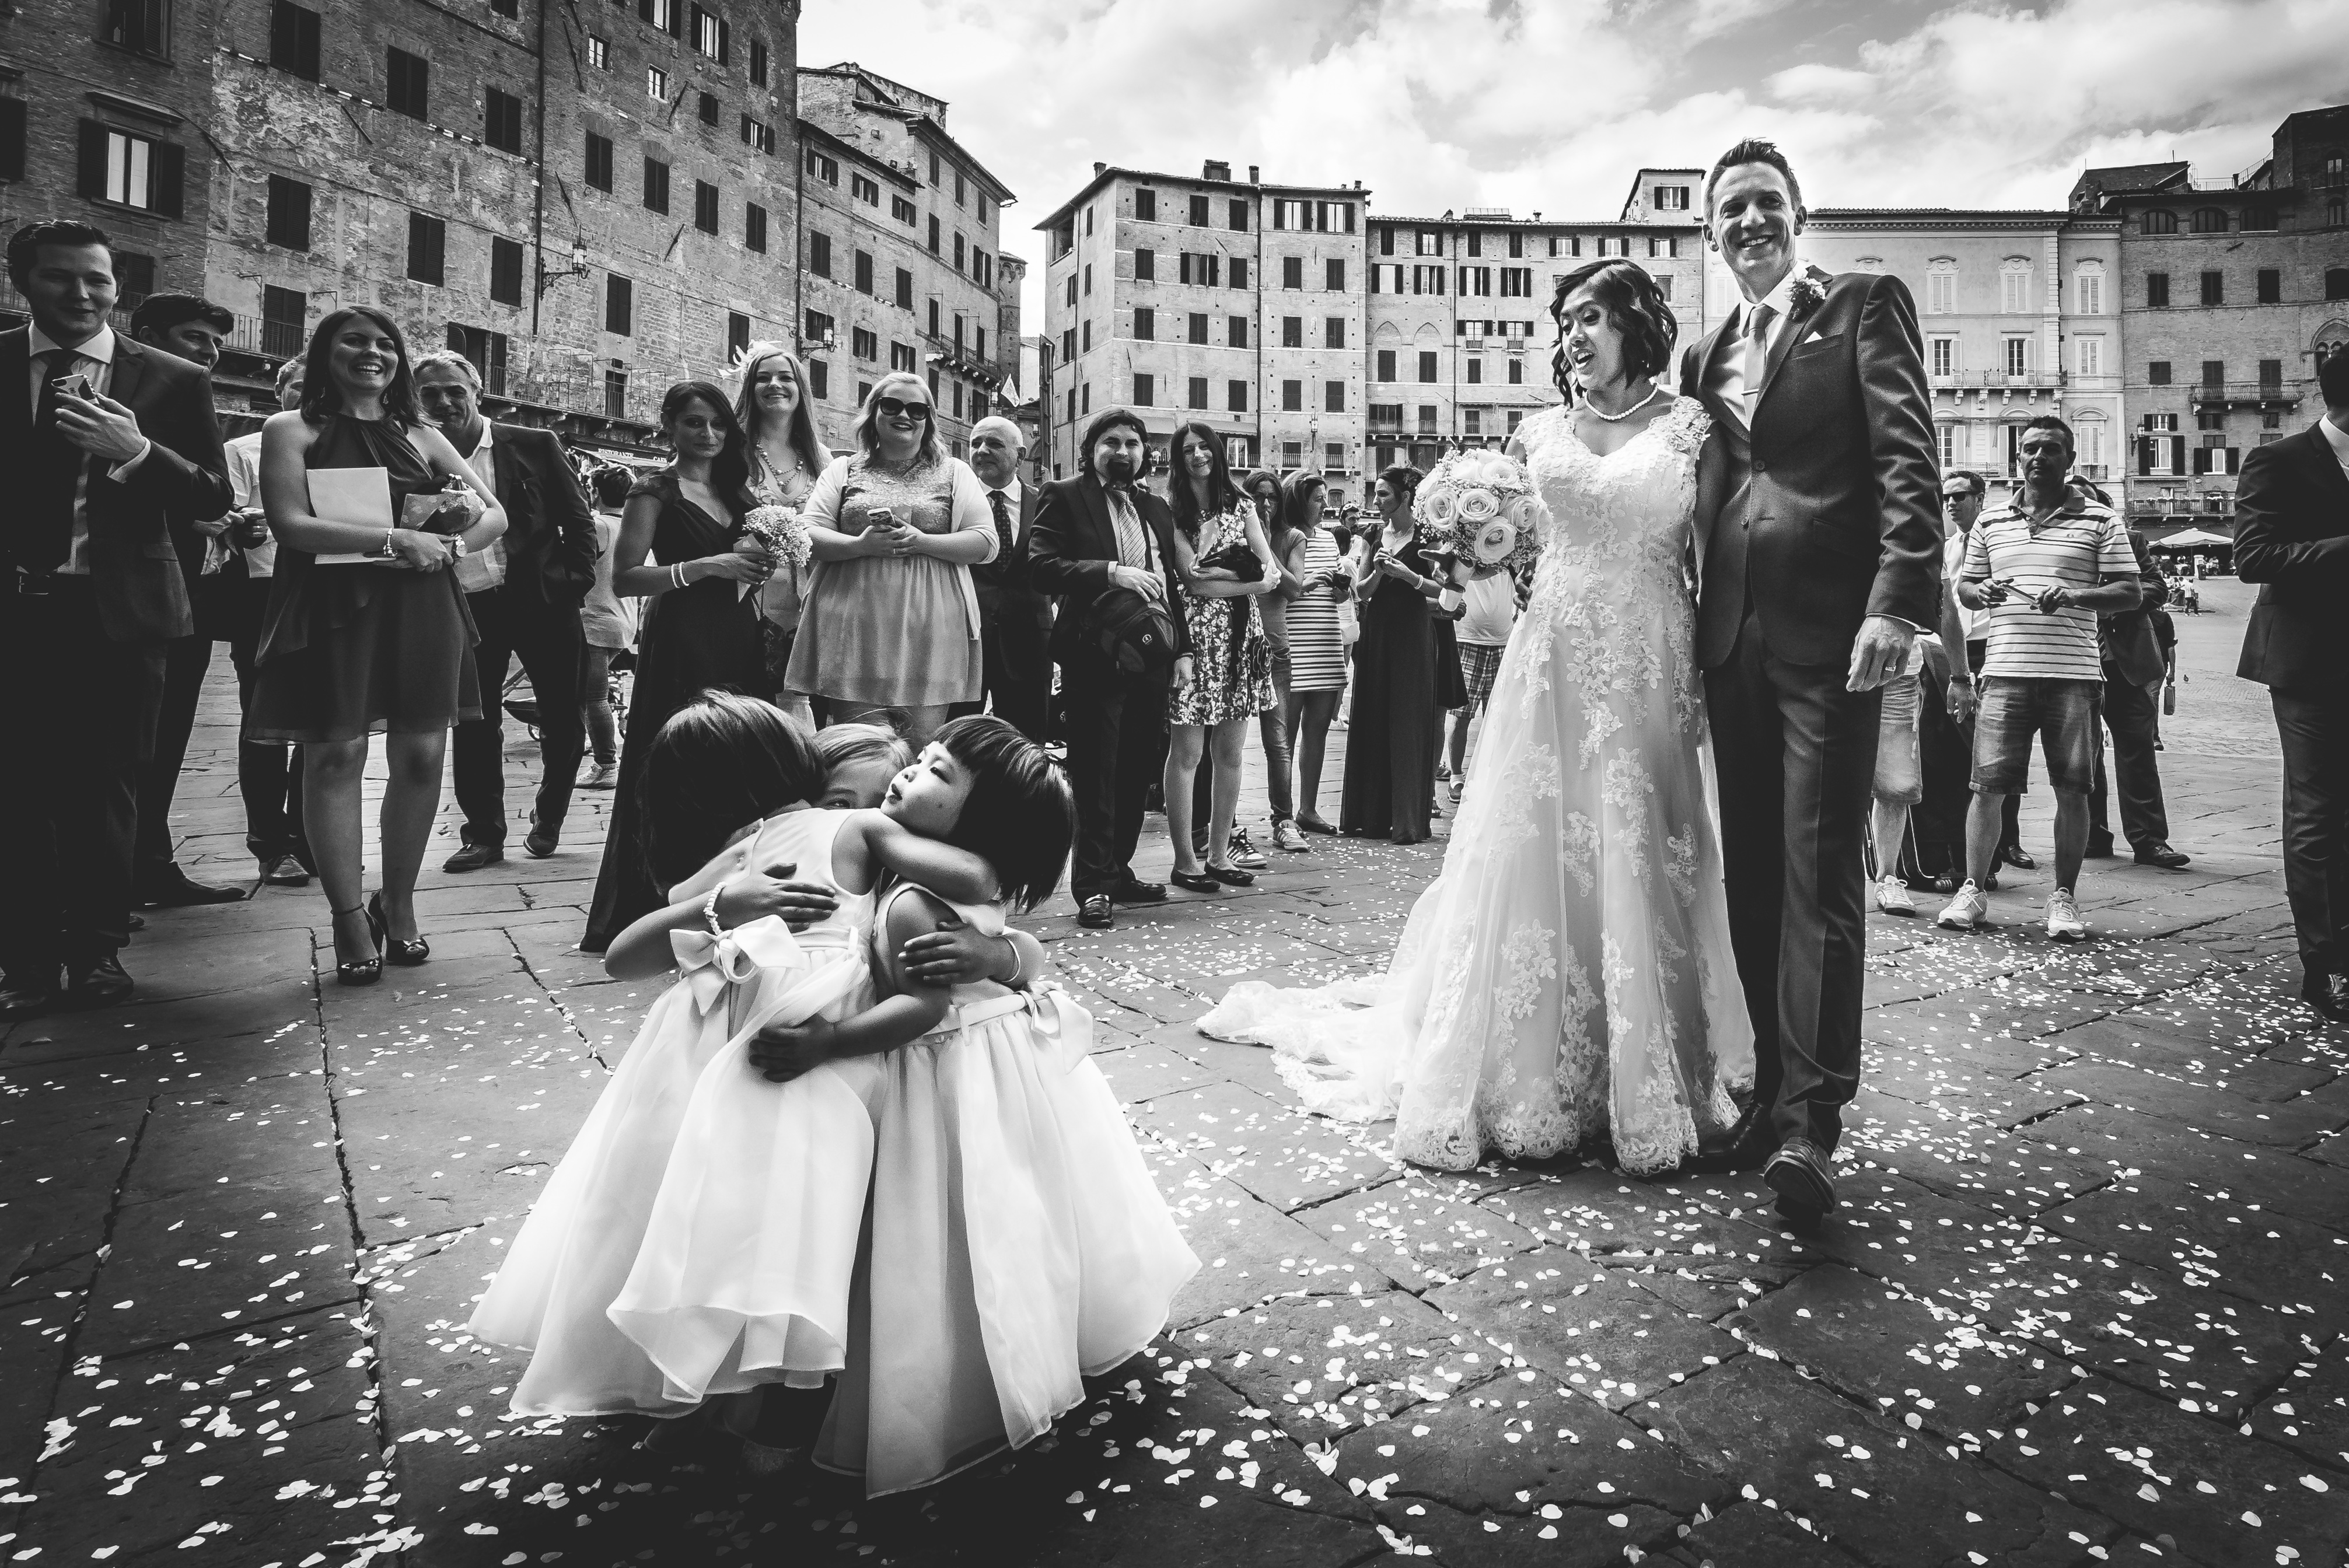 Argentieri Anthony Wedding Photographer1